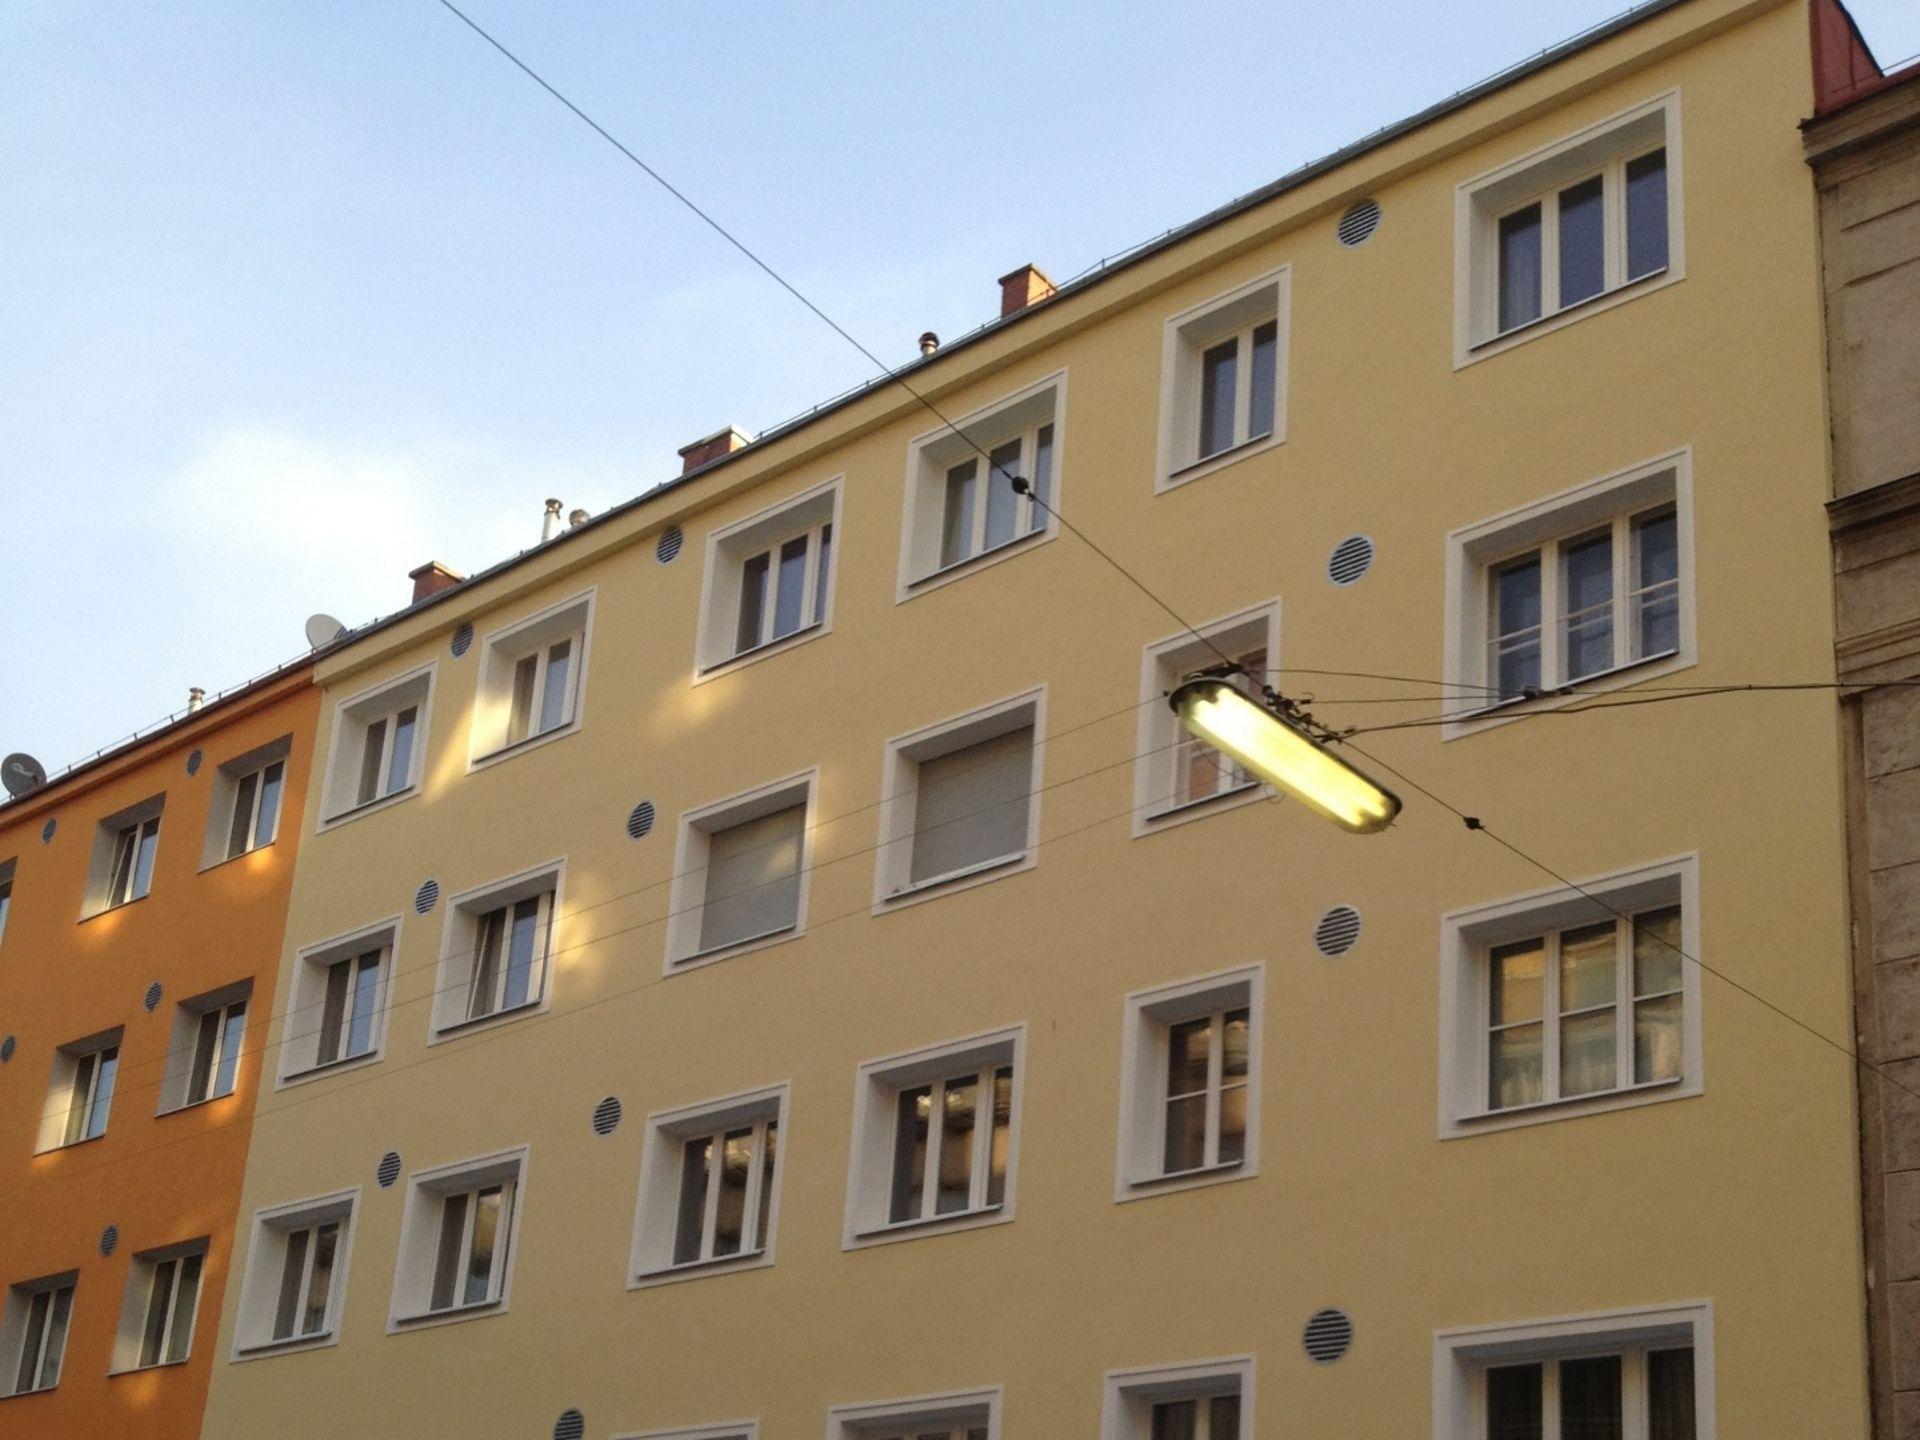 Krebsgartengasse, 1150 Vienna